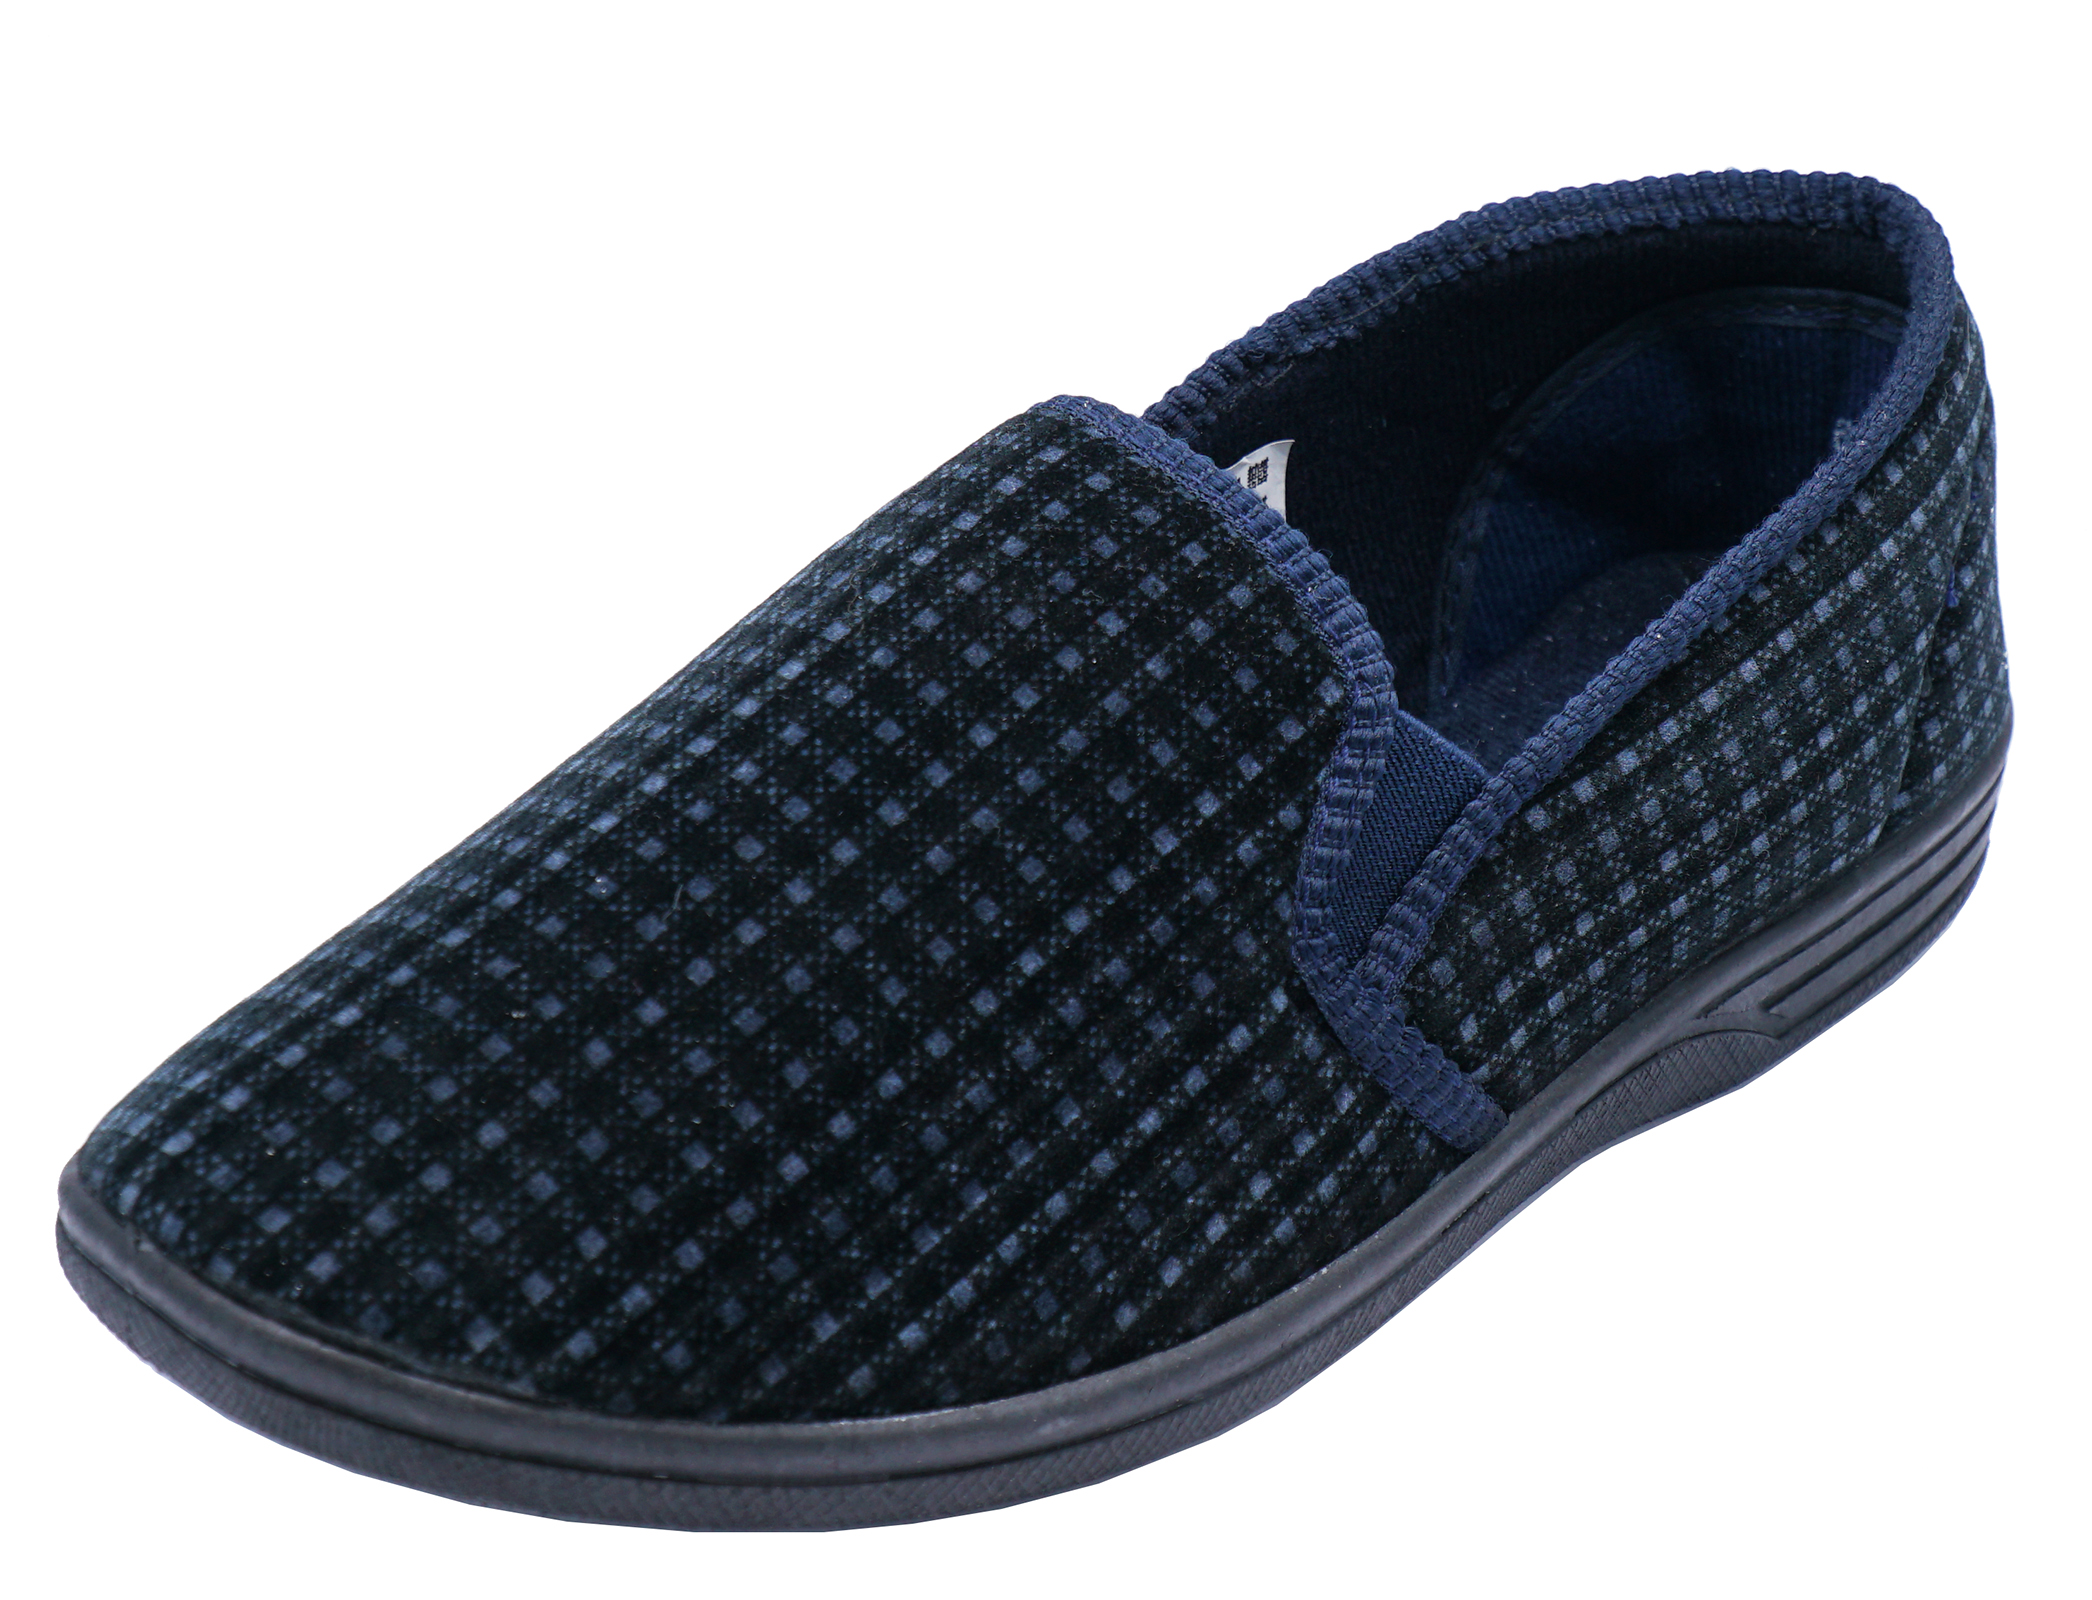 Groovy Mens Navy Comfortable Slippers Slip On Indoor Outdoor Flat Interior Design Ideas Ghosoteloinfo